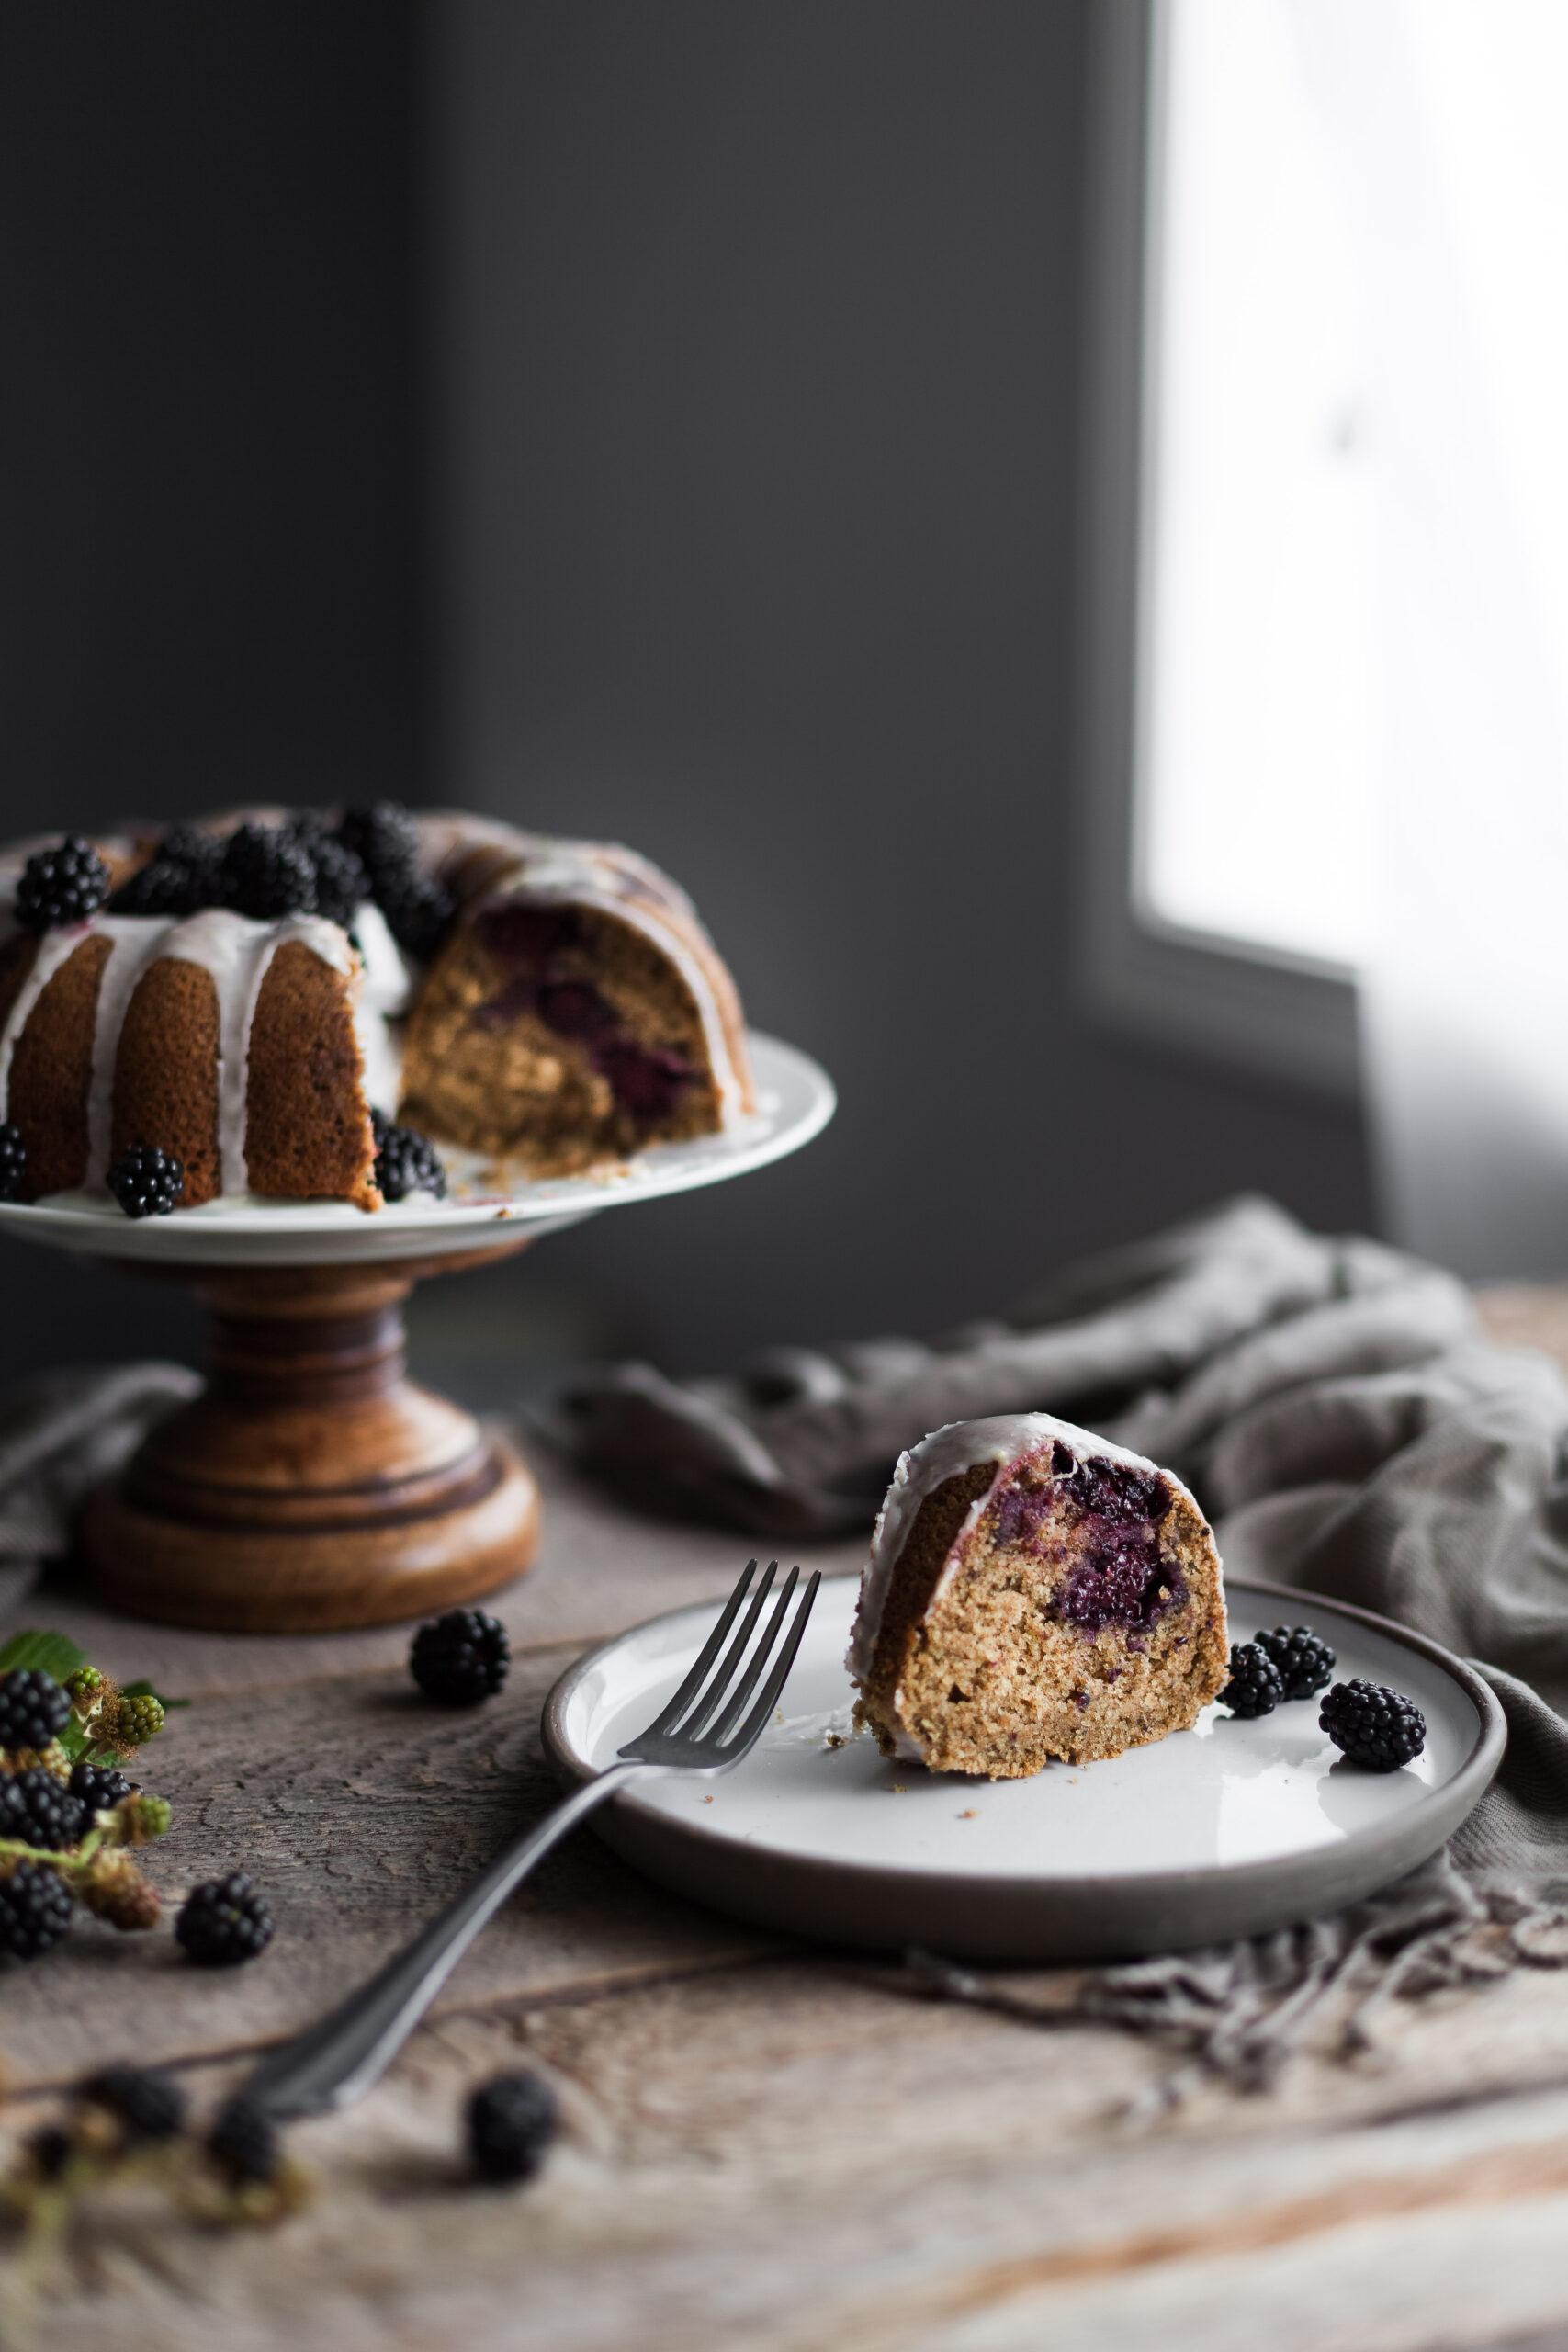 blackberry bundt cake with slice taken out.jpg